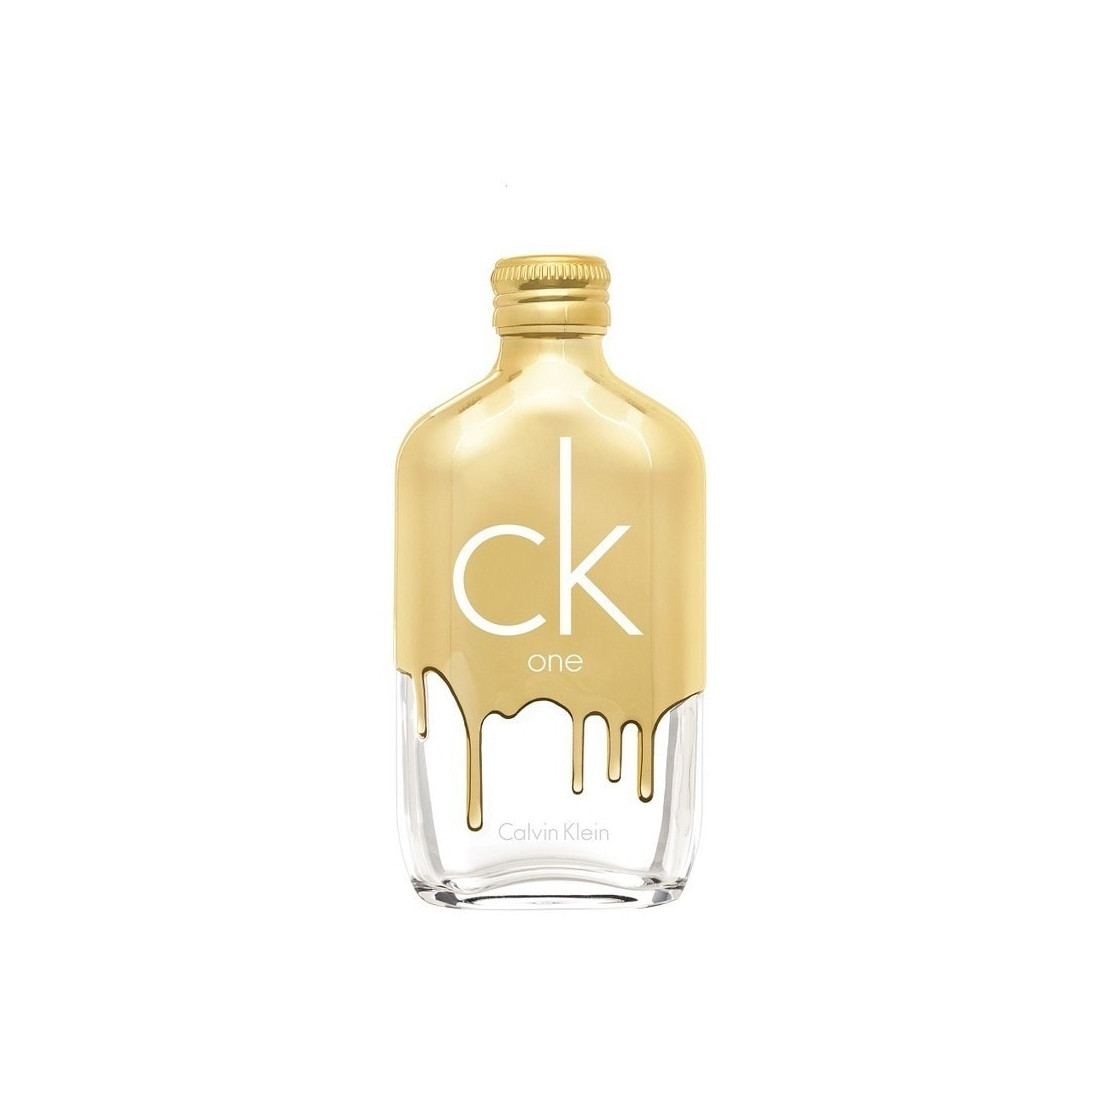 Calvin Klein CK One Gold Eau De Toilette Spray 100 ml